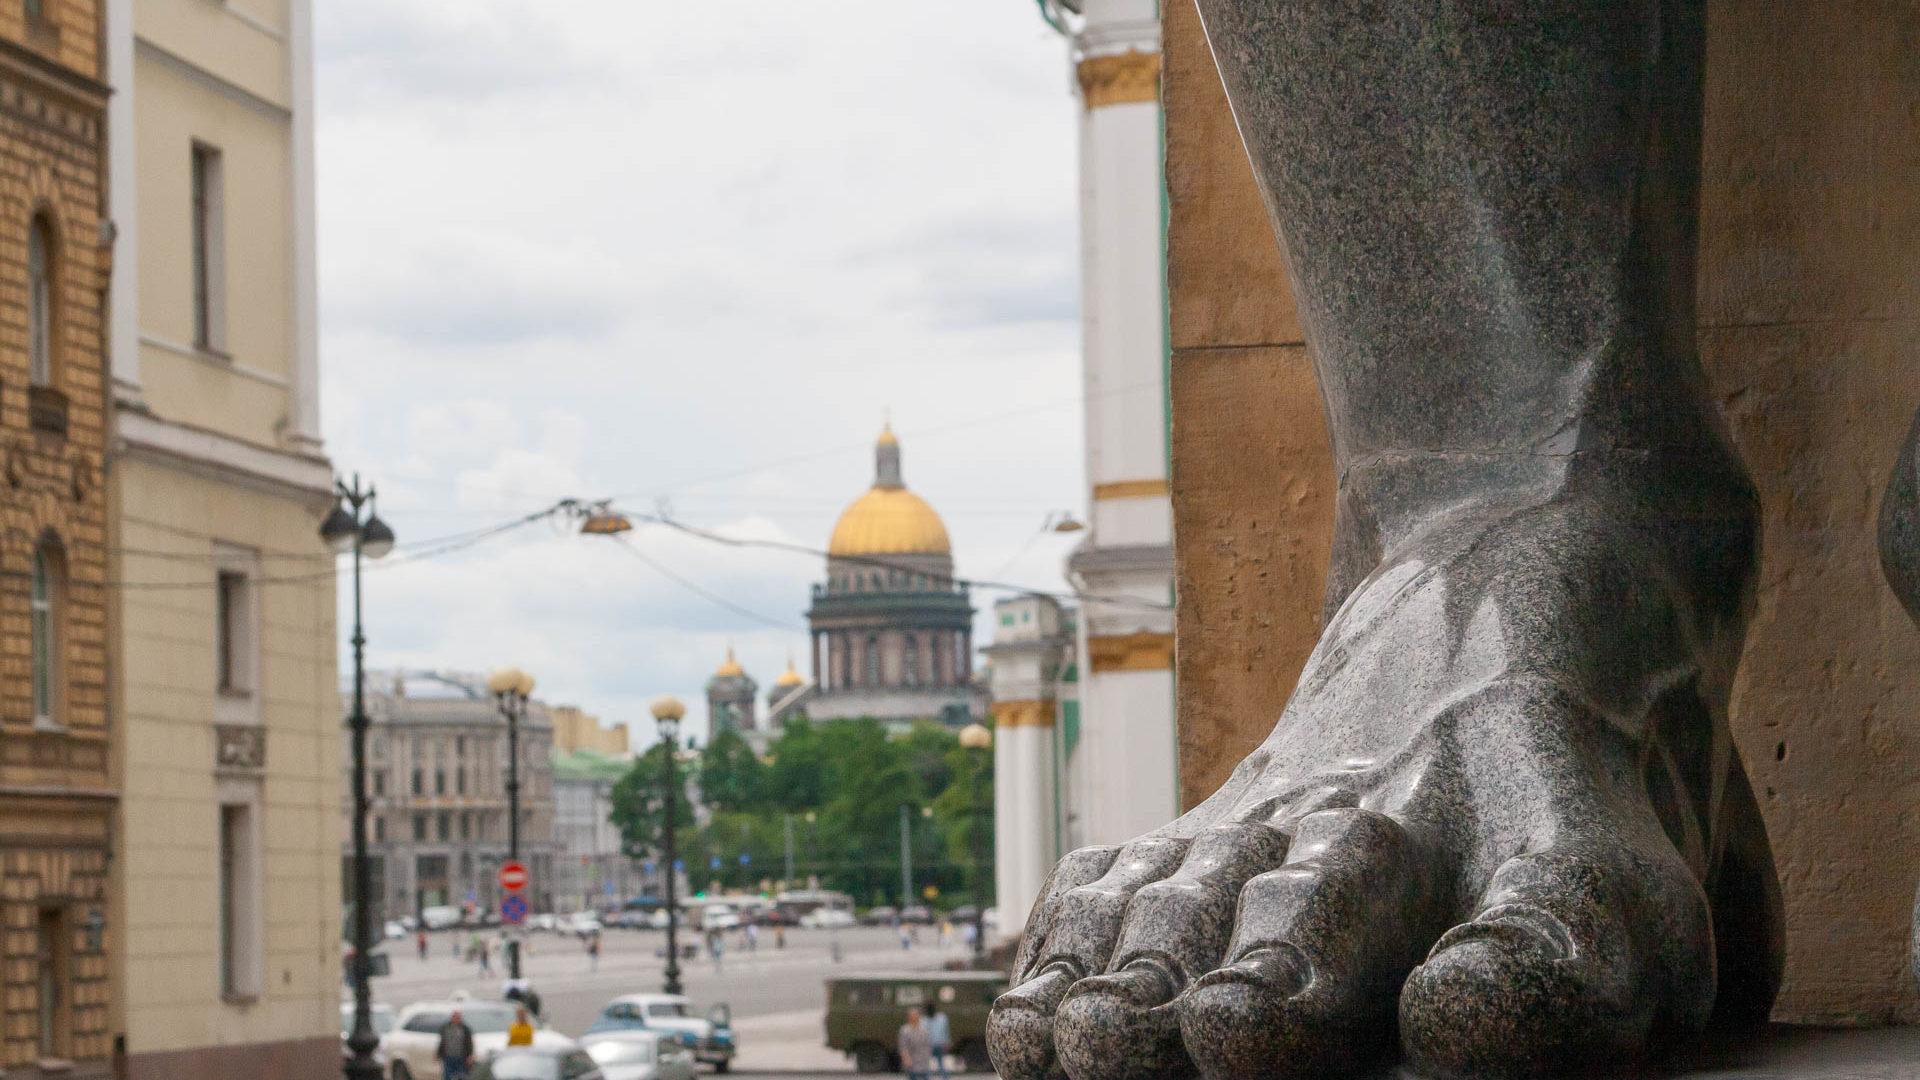 Санкт-Петербург. Эрмитаж. Фотограф Вадим Кукшинов.